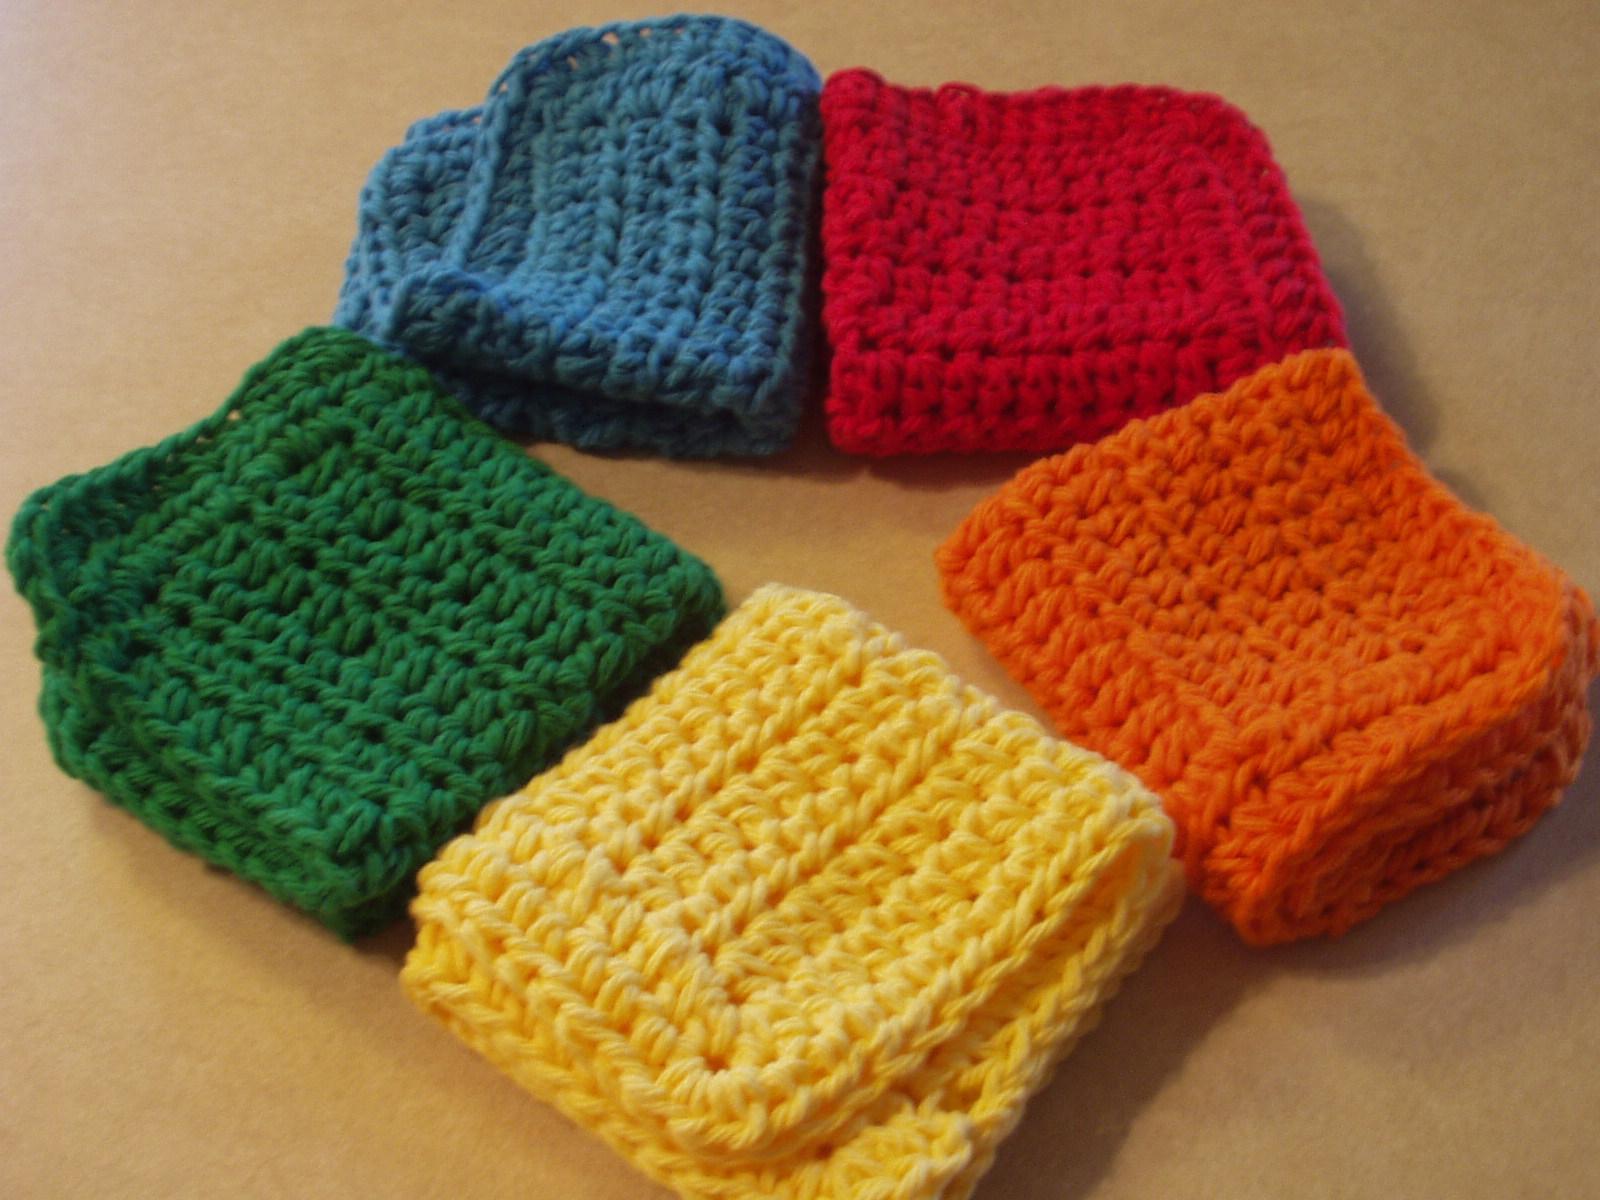 Crochet Patterns For Beginners Dishcloths : crochet:: my favorite dishcloth yarnchick40